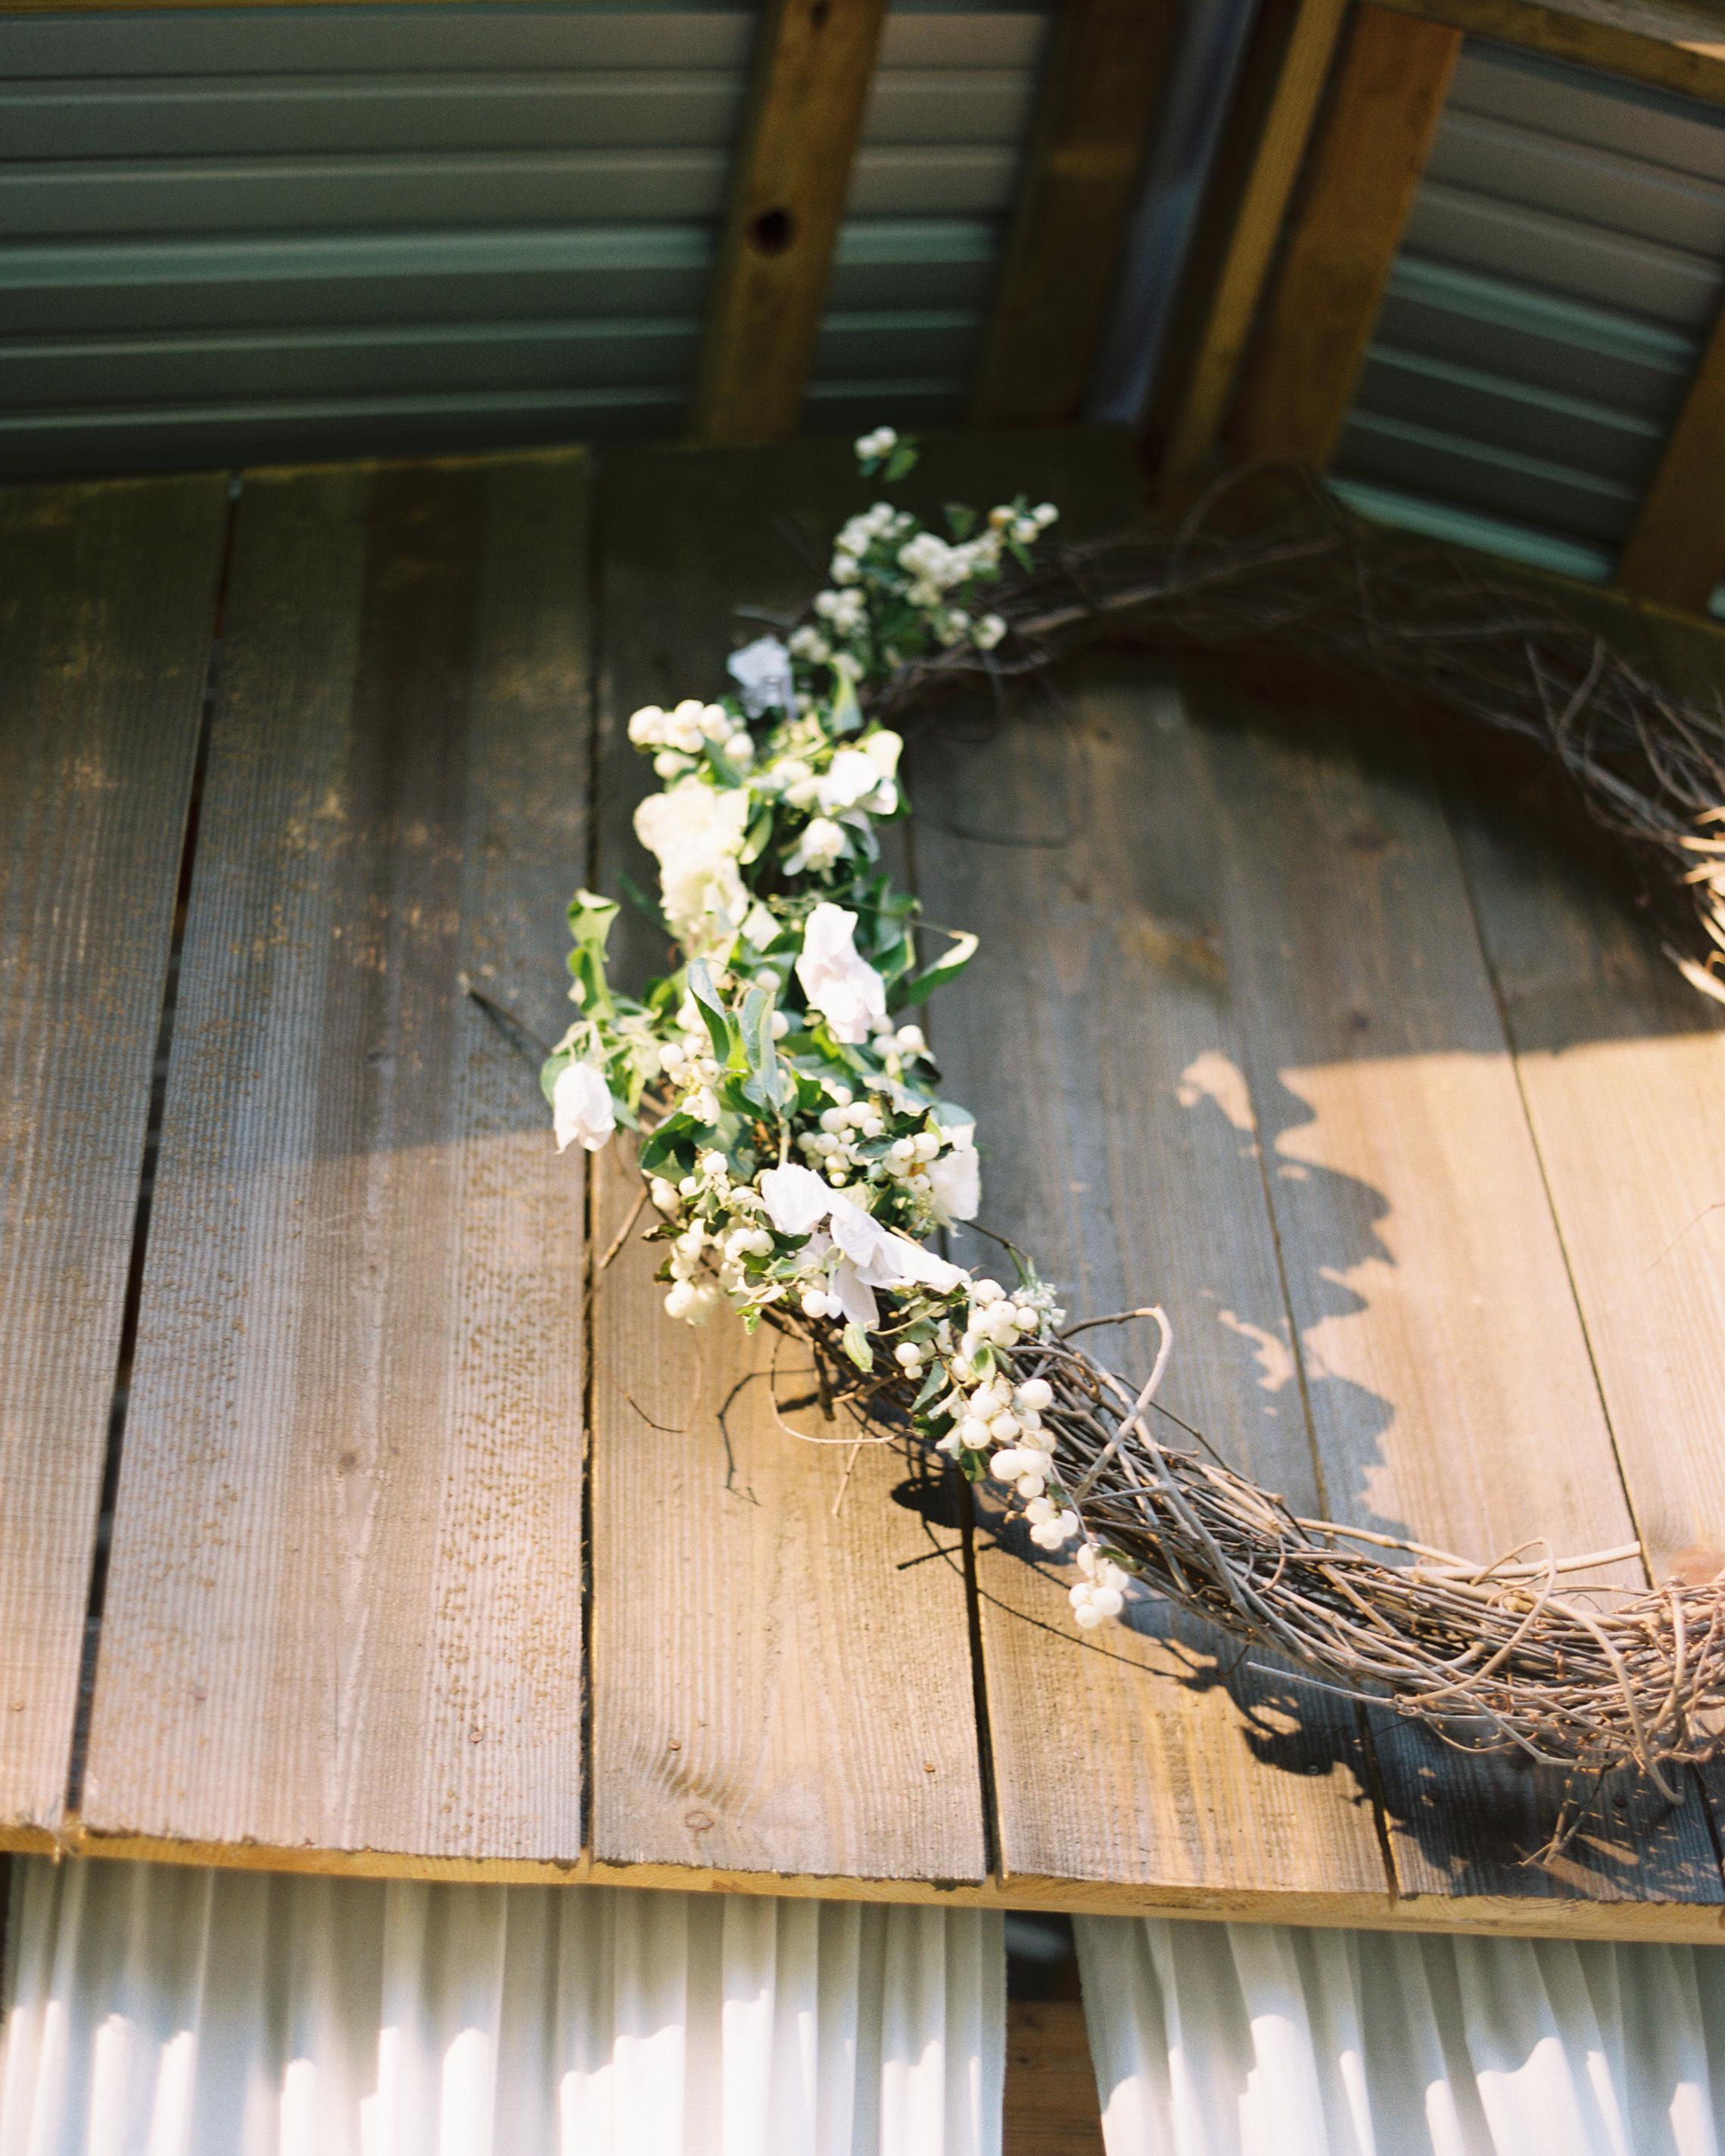 saron-neal-wedding-mississippi-00320-s111701-0615.jpg